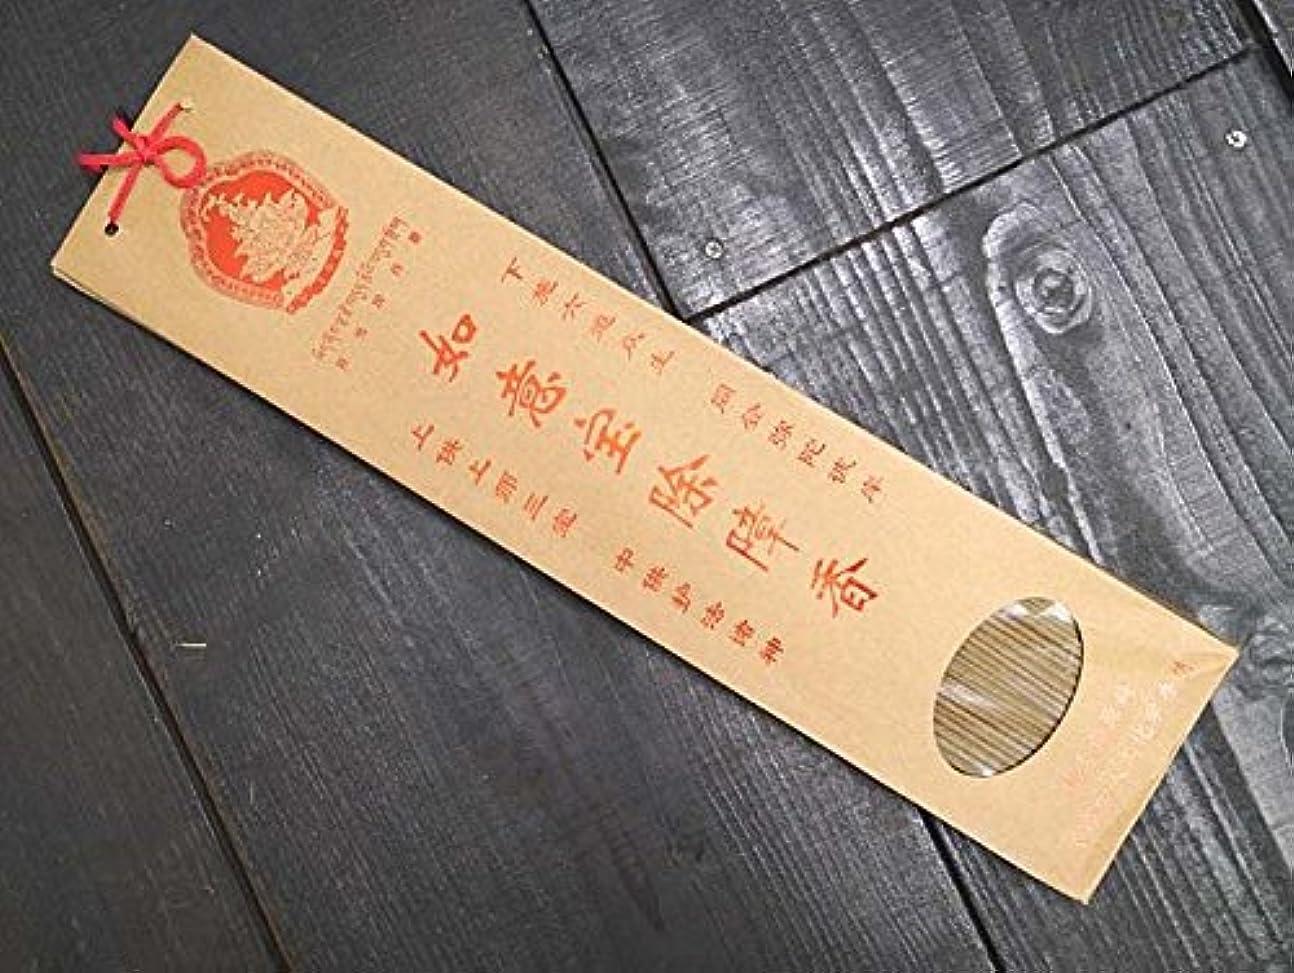 小麦粉資源初心者如意宝 中国湖北省武漢市で作られる除障香【如意宝除障香】